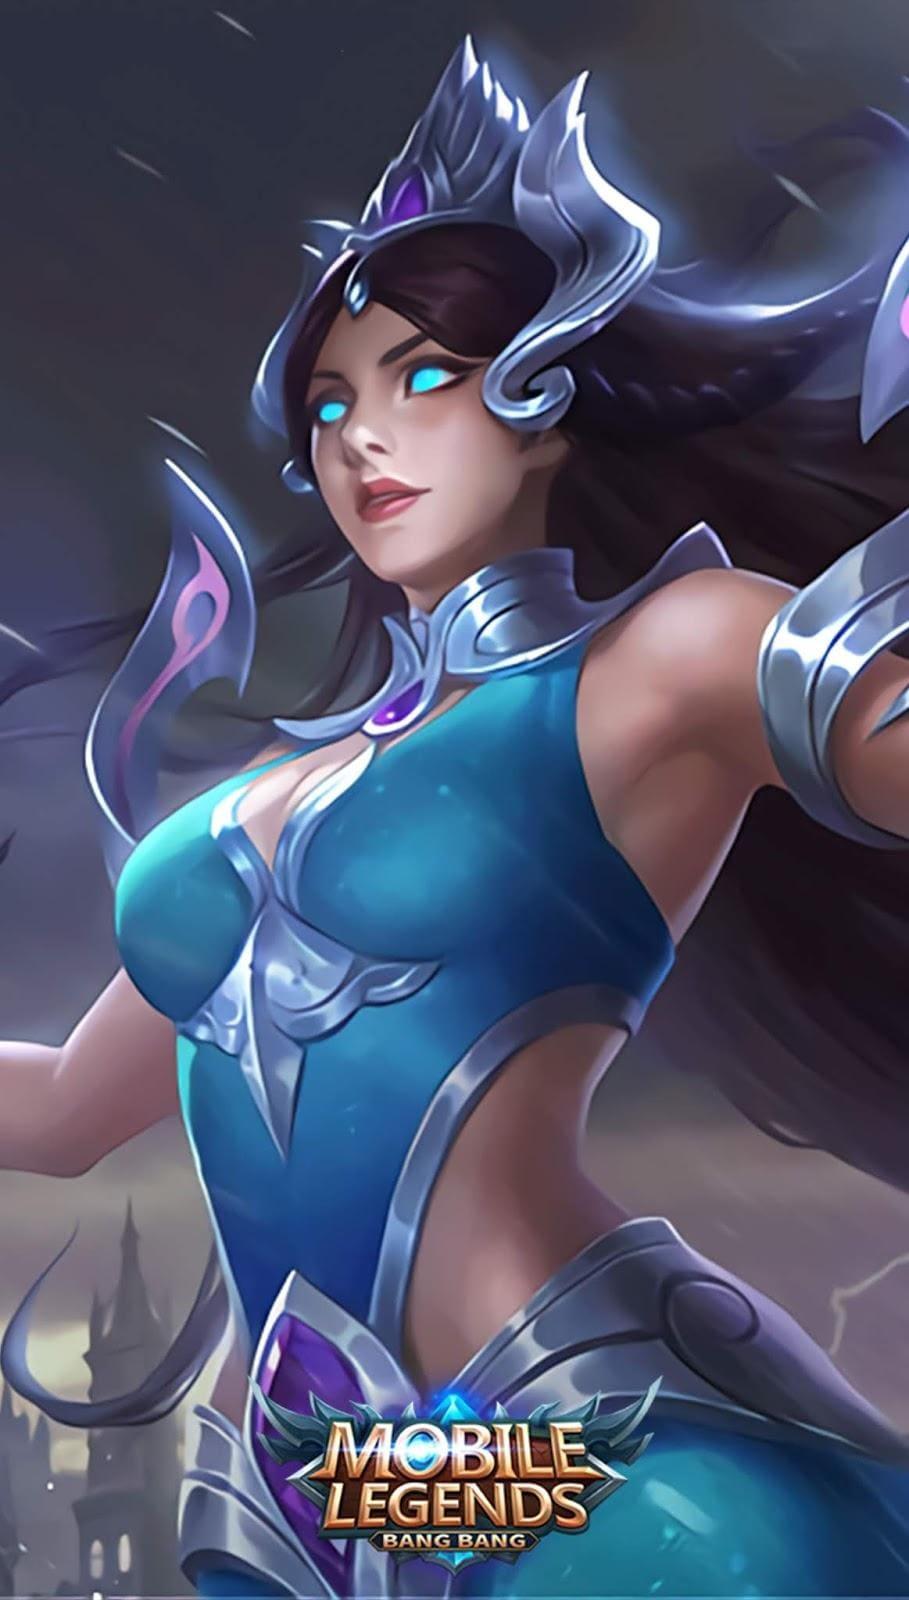 Wallpaper Kadita Atlantean Princess Skin Mobile Legends HD for Android and iOS